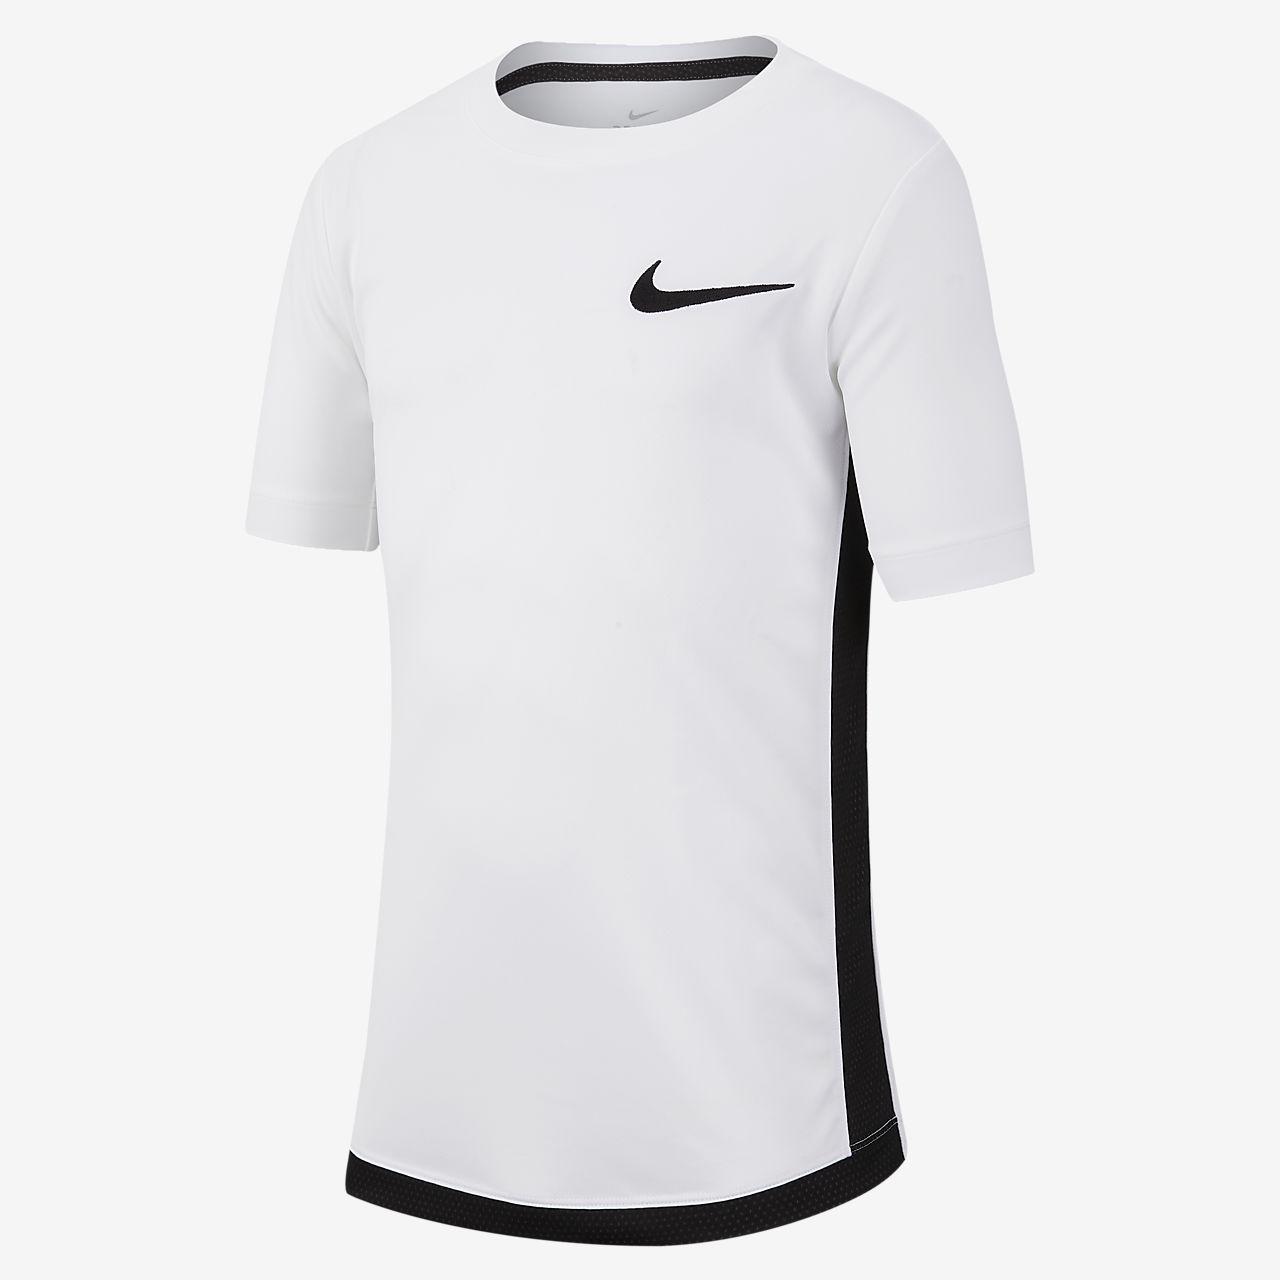 Nike Dri-FIT Older Kids' (Boys') Short-Sleeve Training Top